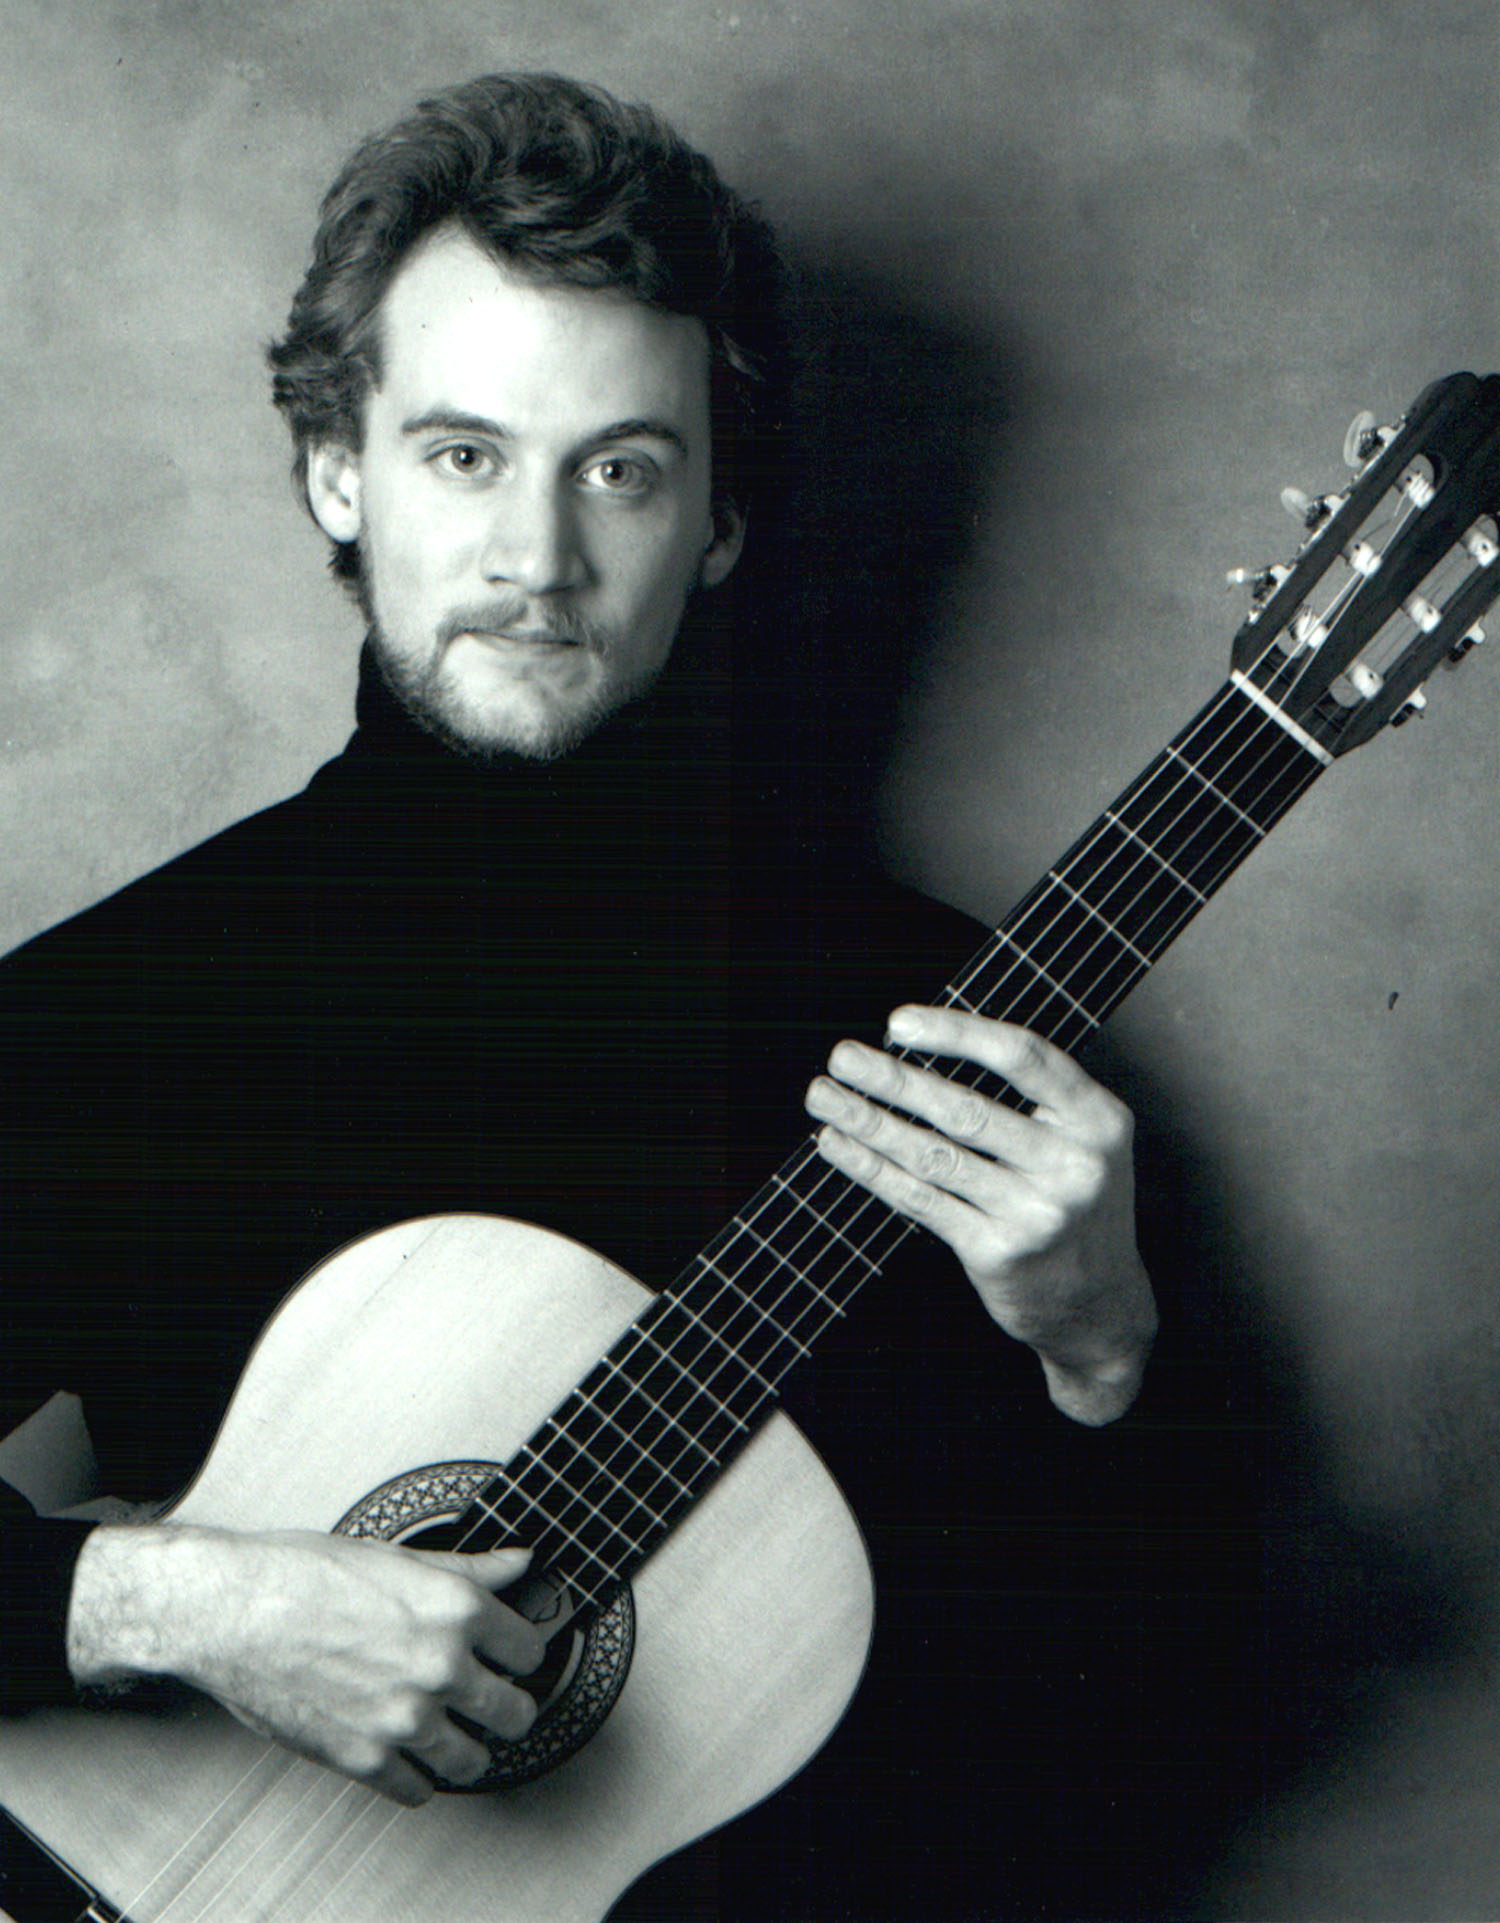 duo_tenebroso_david_franzen_young_classical_guitar.jpg